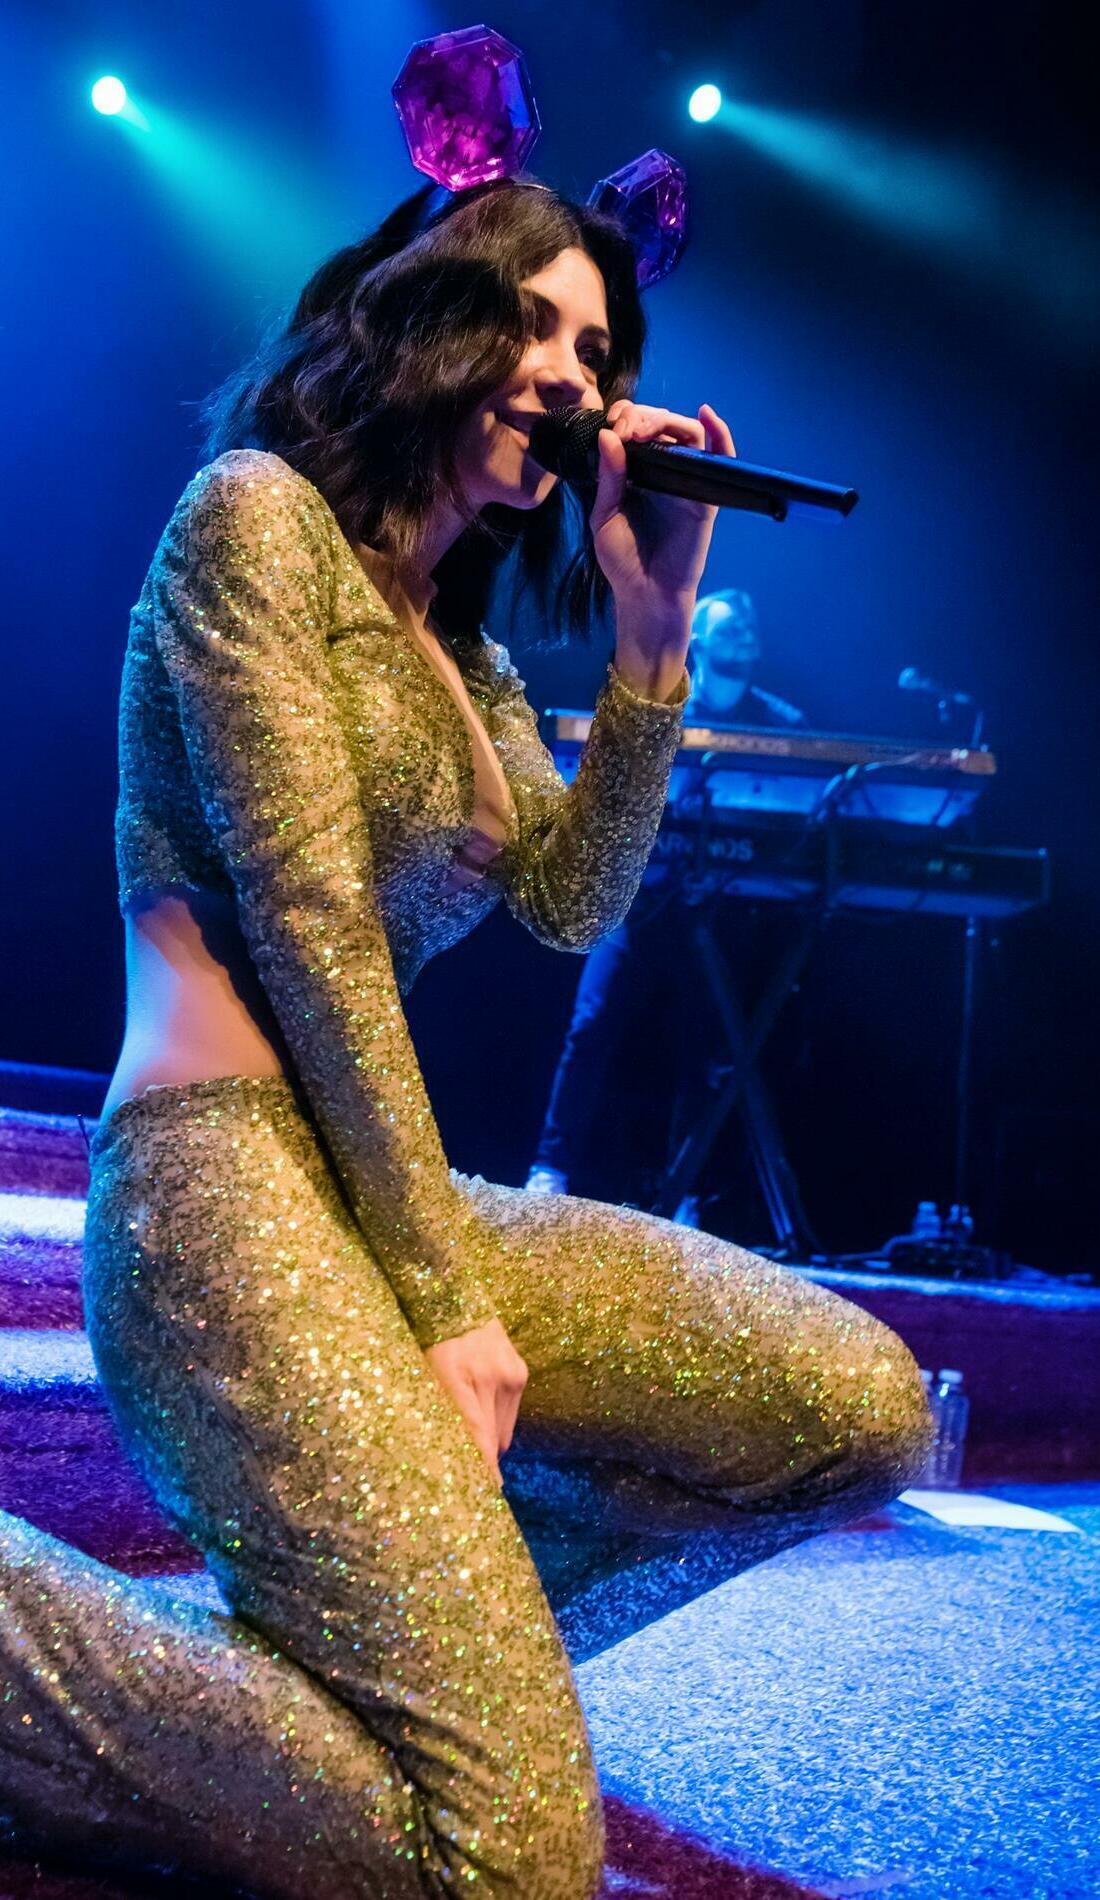 A Marina And The Diamonds live event